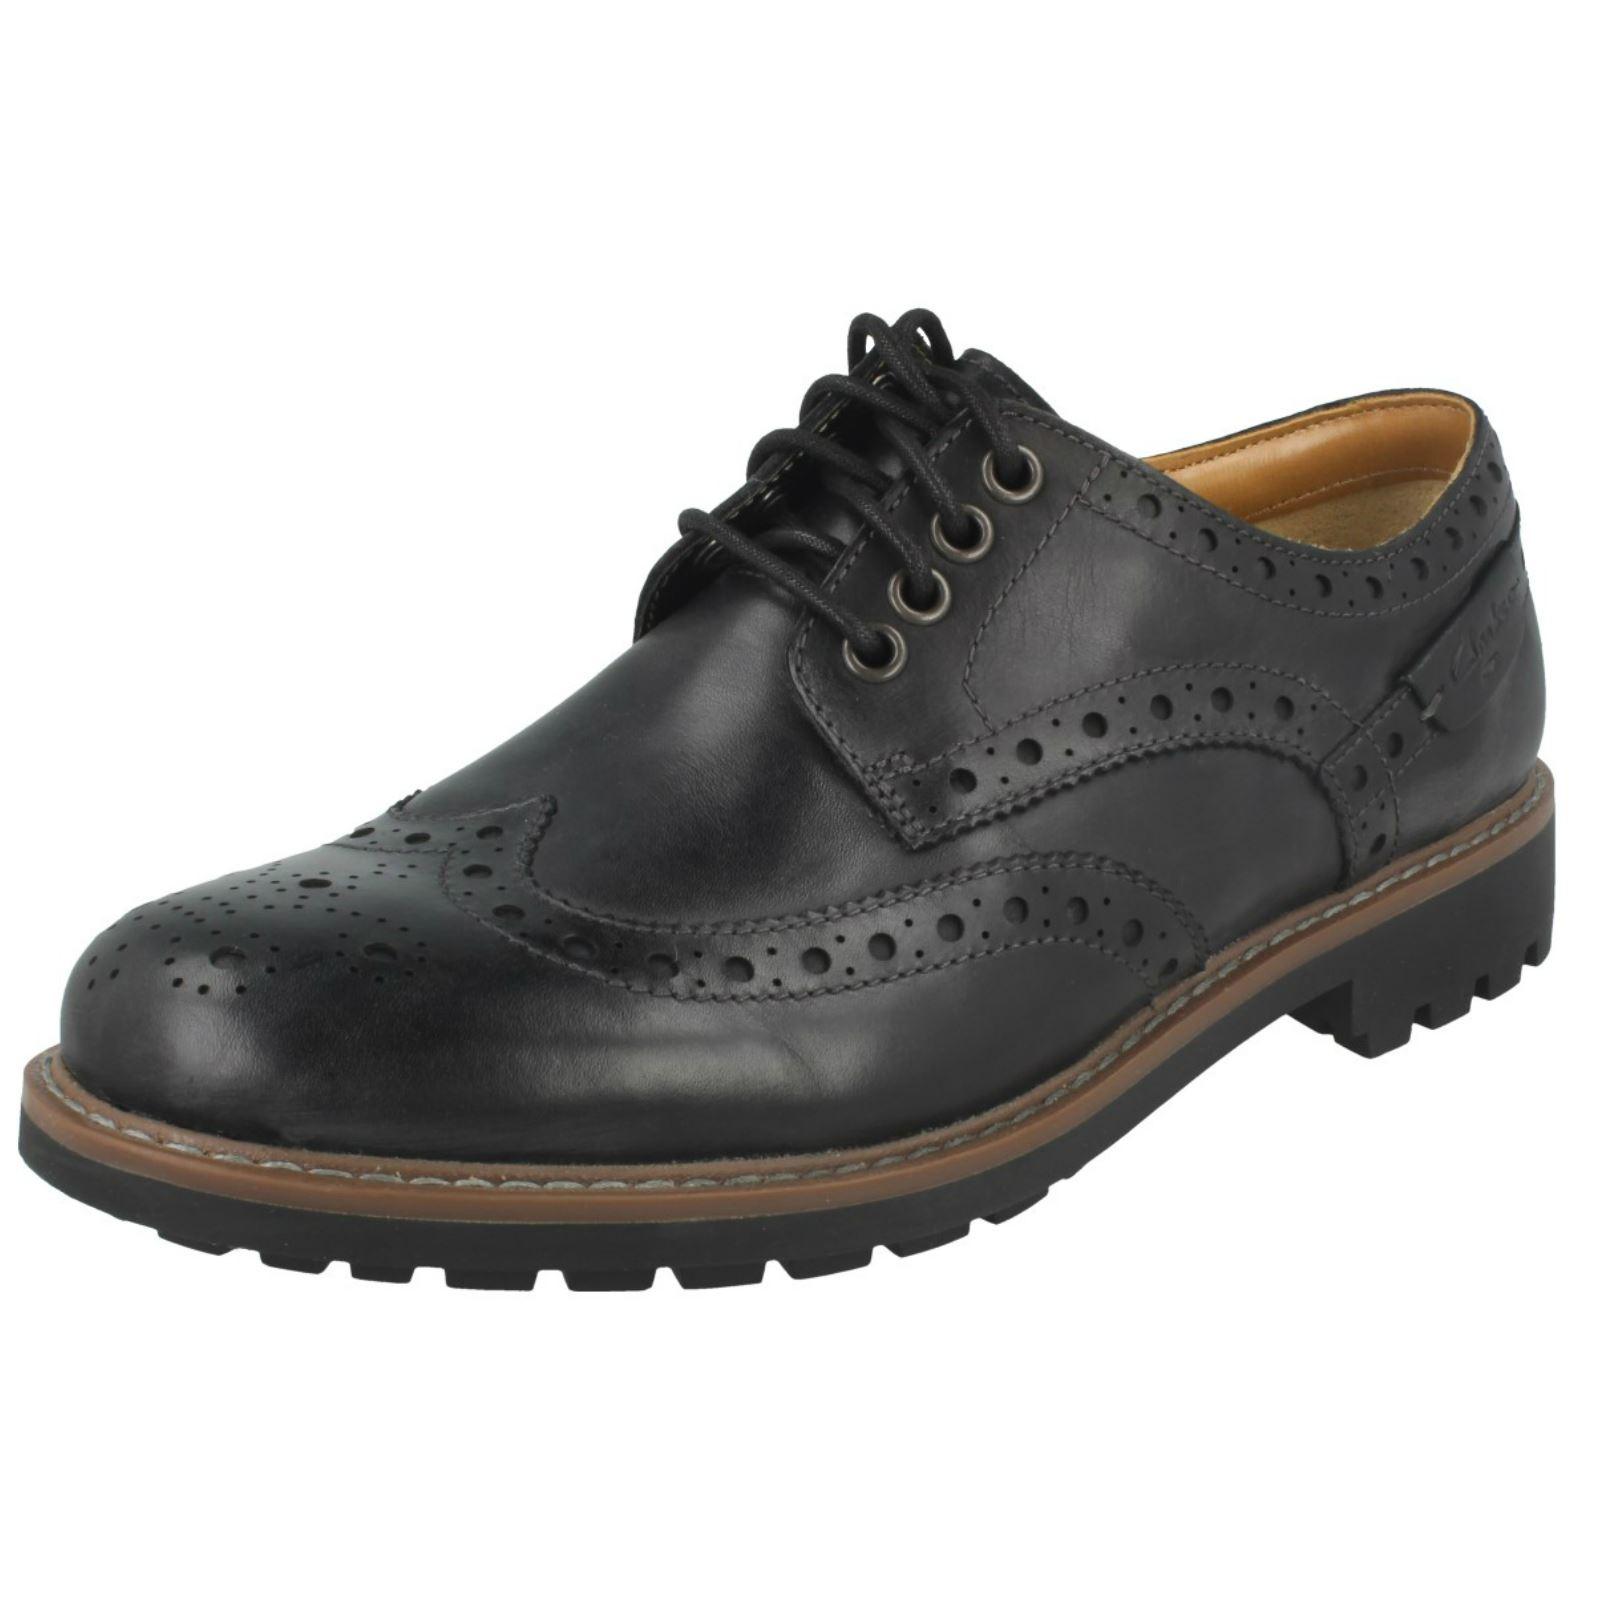 3c8e1a1084c66 Clarks Montacute Wing - Black Leather Mens Shoes 11 UK 20646417   eBay